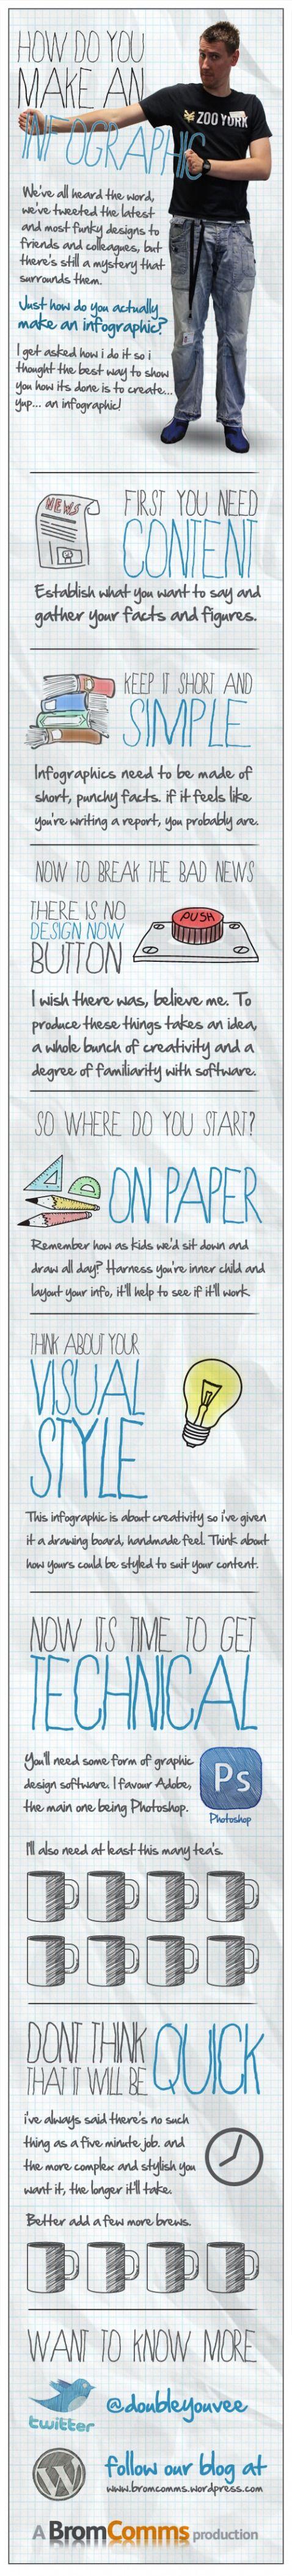 Cómo hacer infografías #infografia #infographic #design